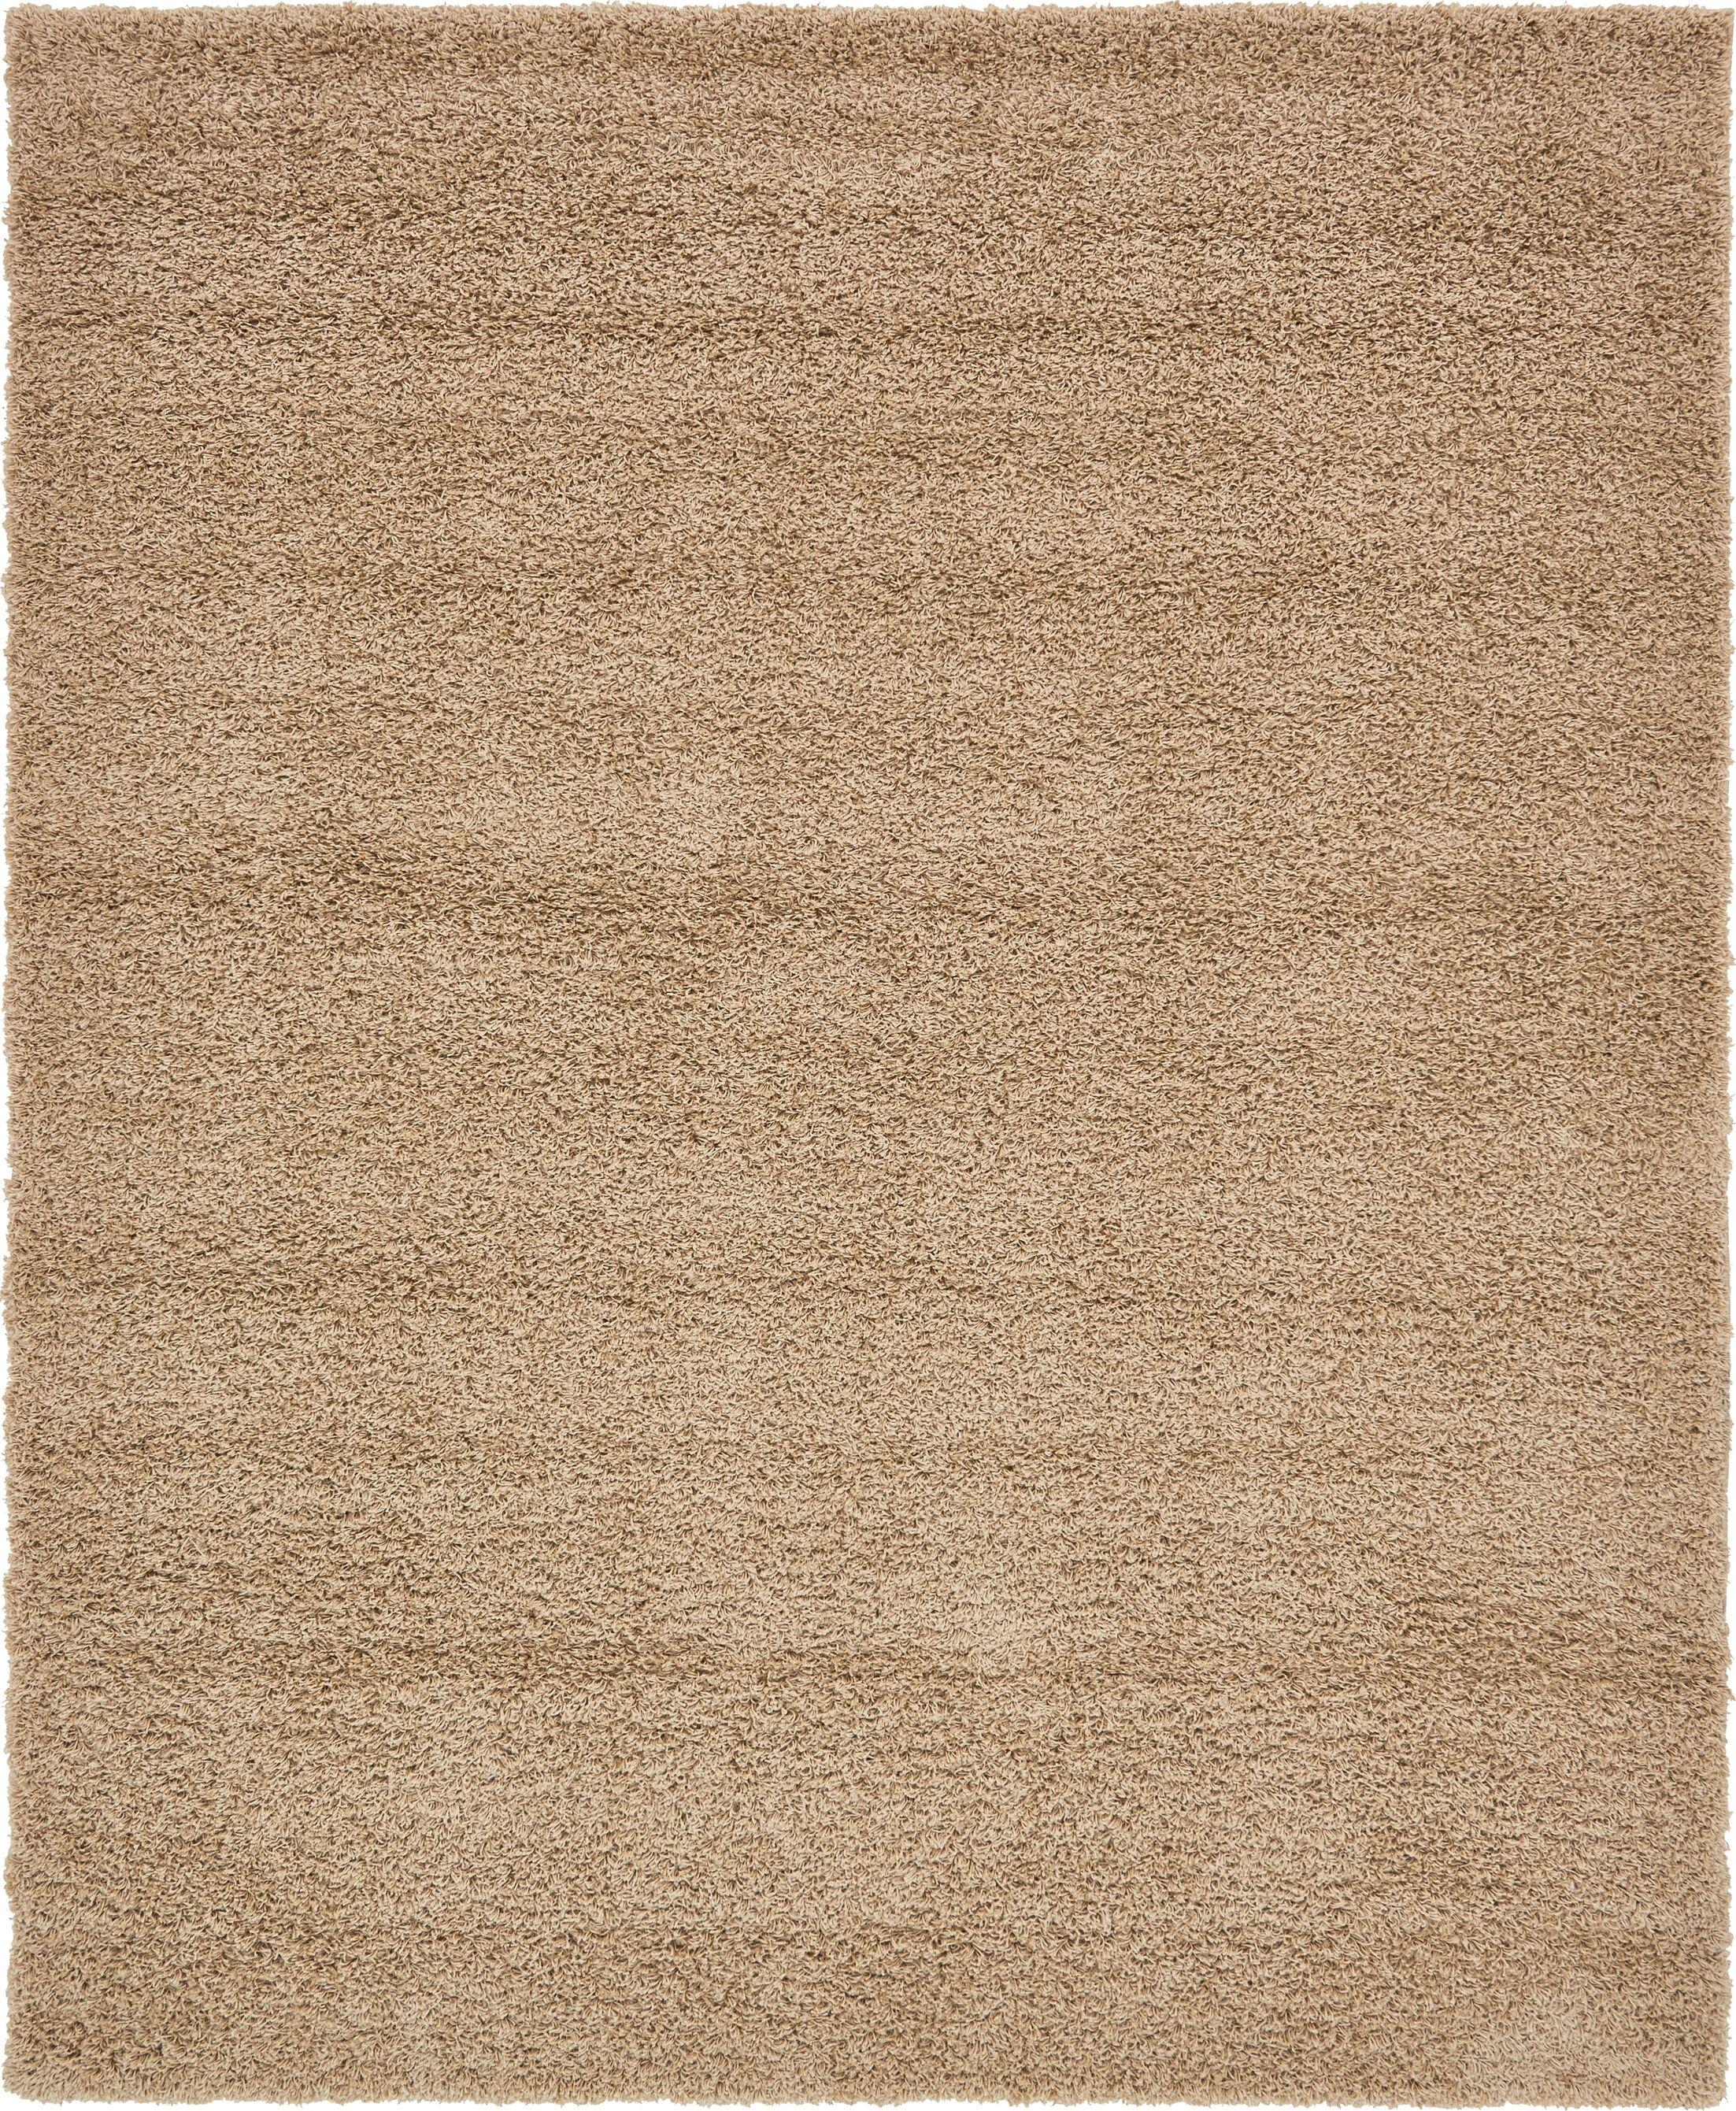 Ethelyn Lilah Area Rug Rug Size: Rectangle 8' x 10'